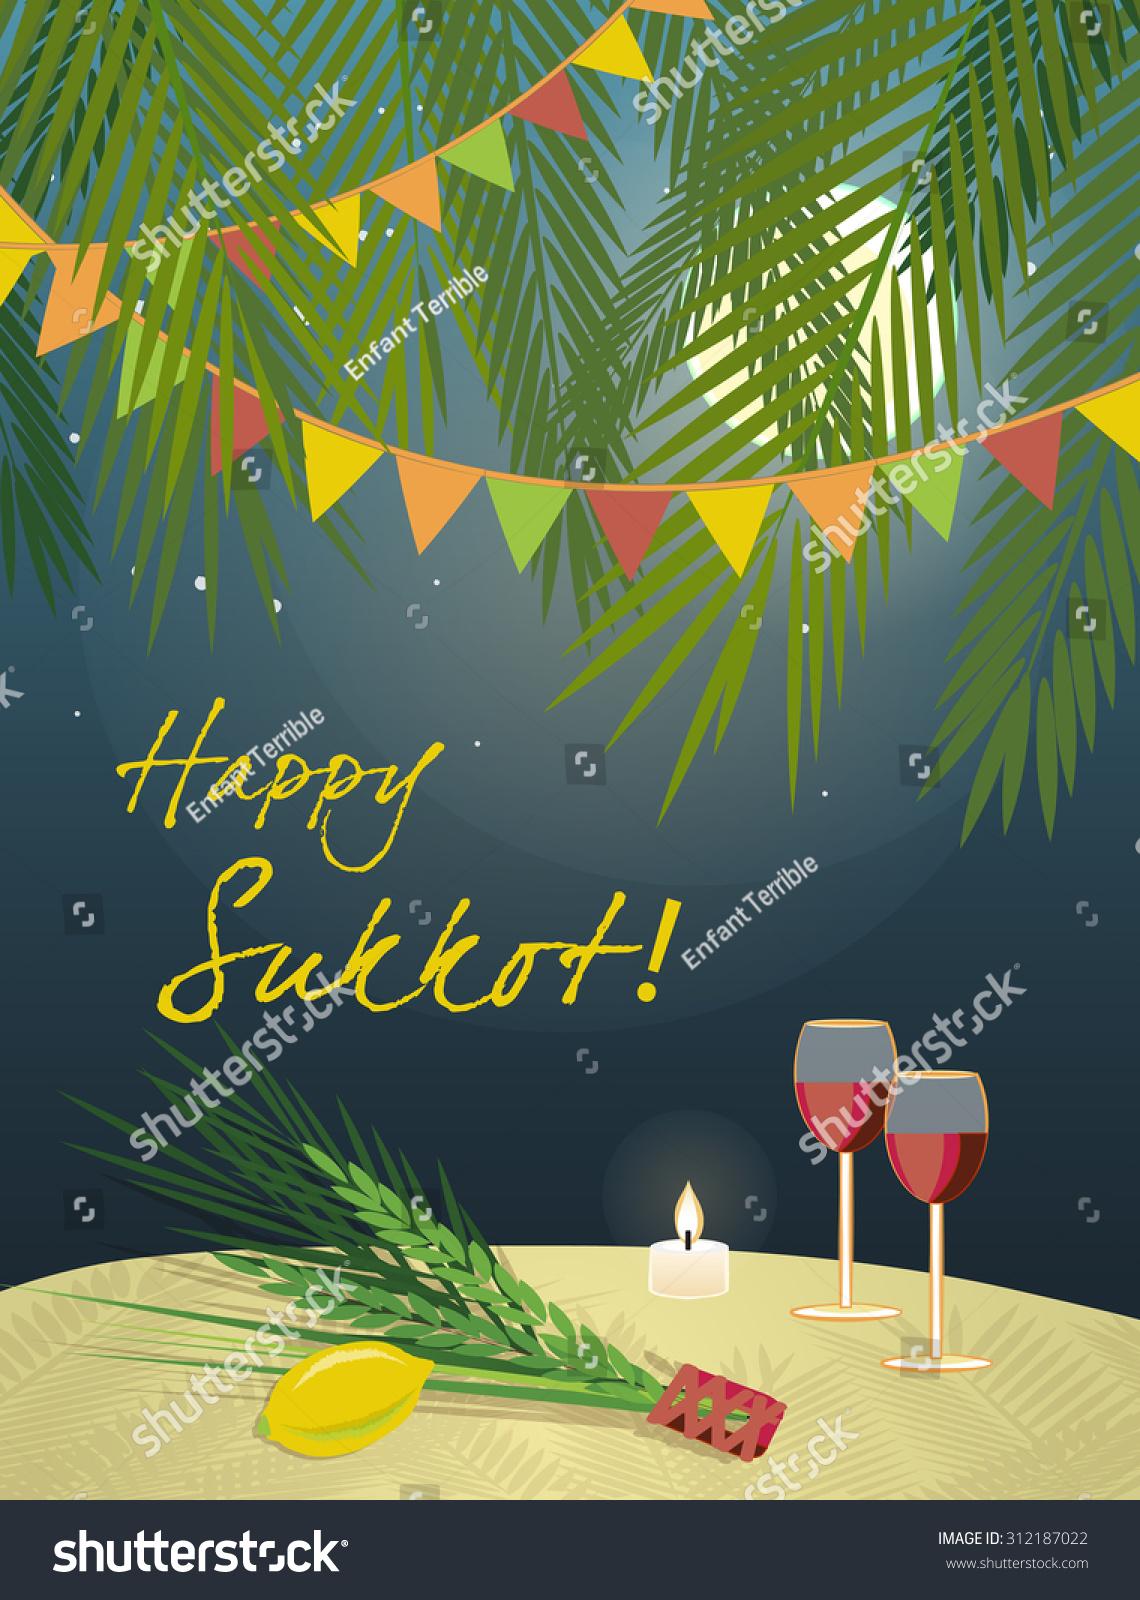 Royalty free sukkot festival greeting card design 312187022 stock sukkot festival greeting card design vector template greeting text happy sukkot traditional jewish sukkot m4hsunfo